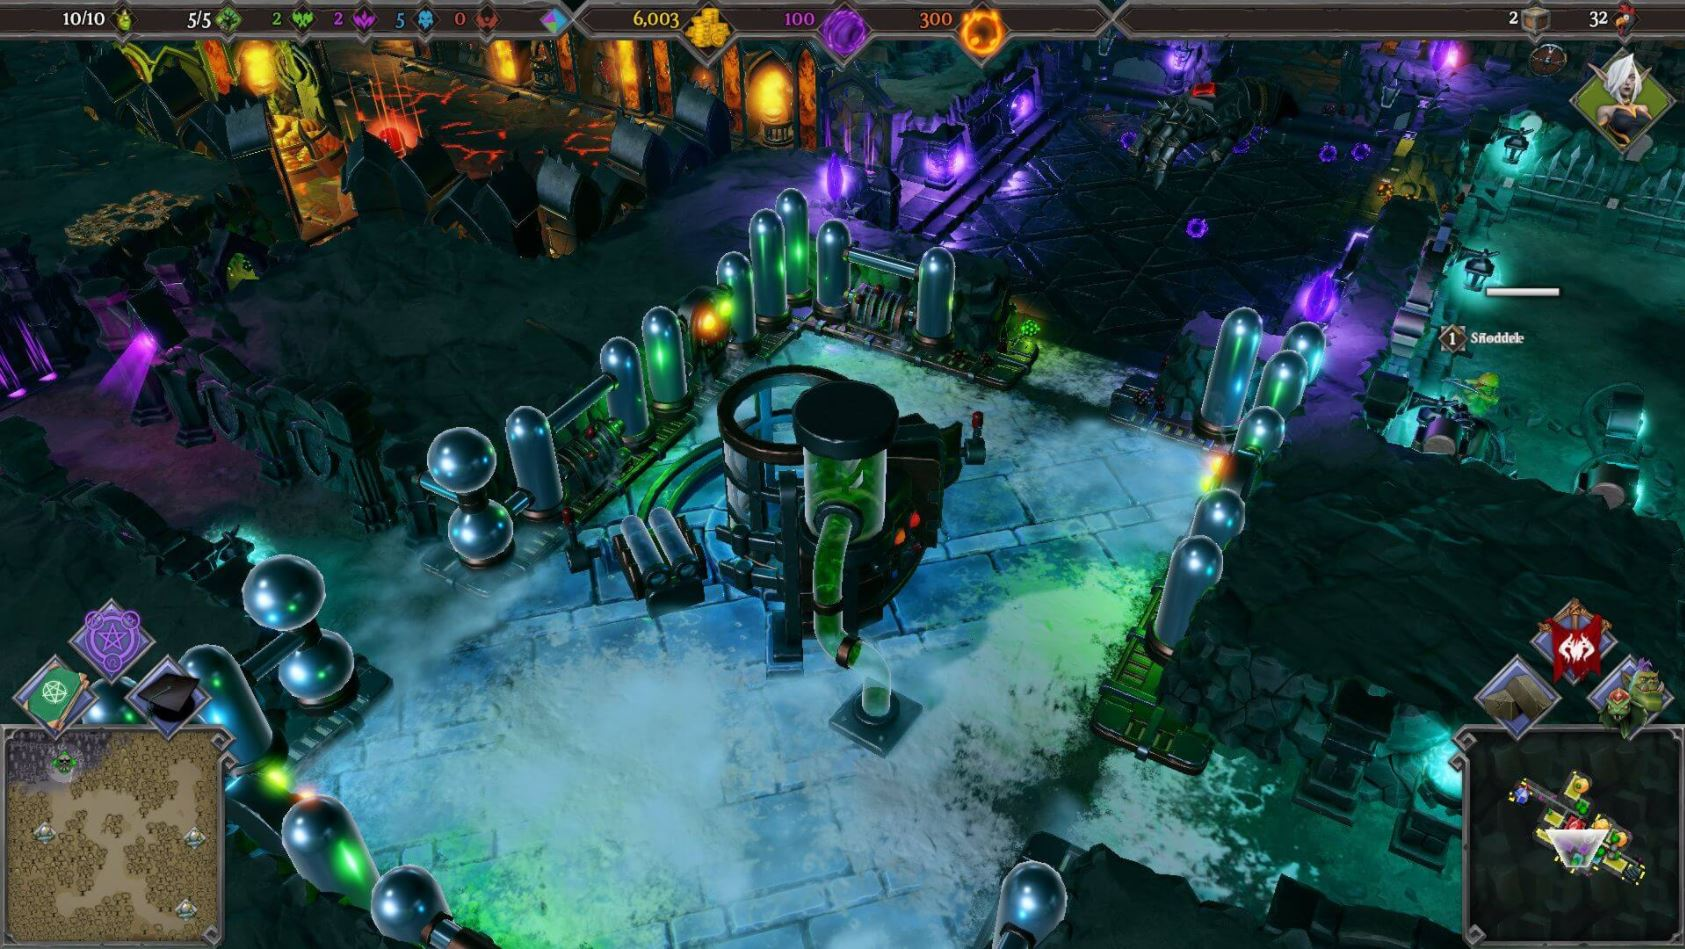 Dungeons 3 sur Steam promo dungeons 2 screen14